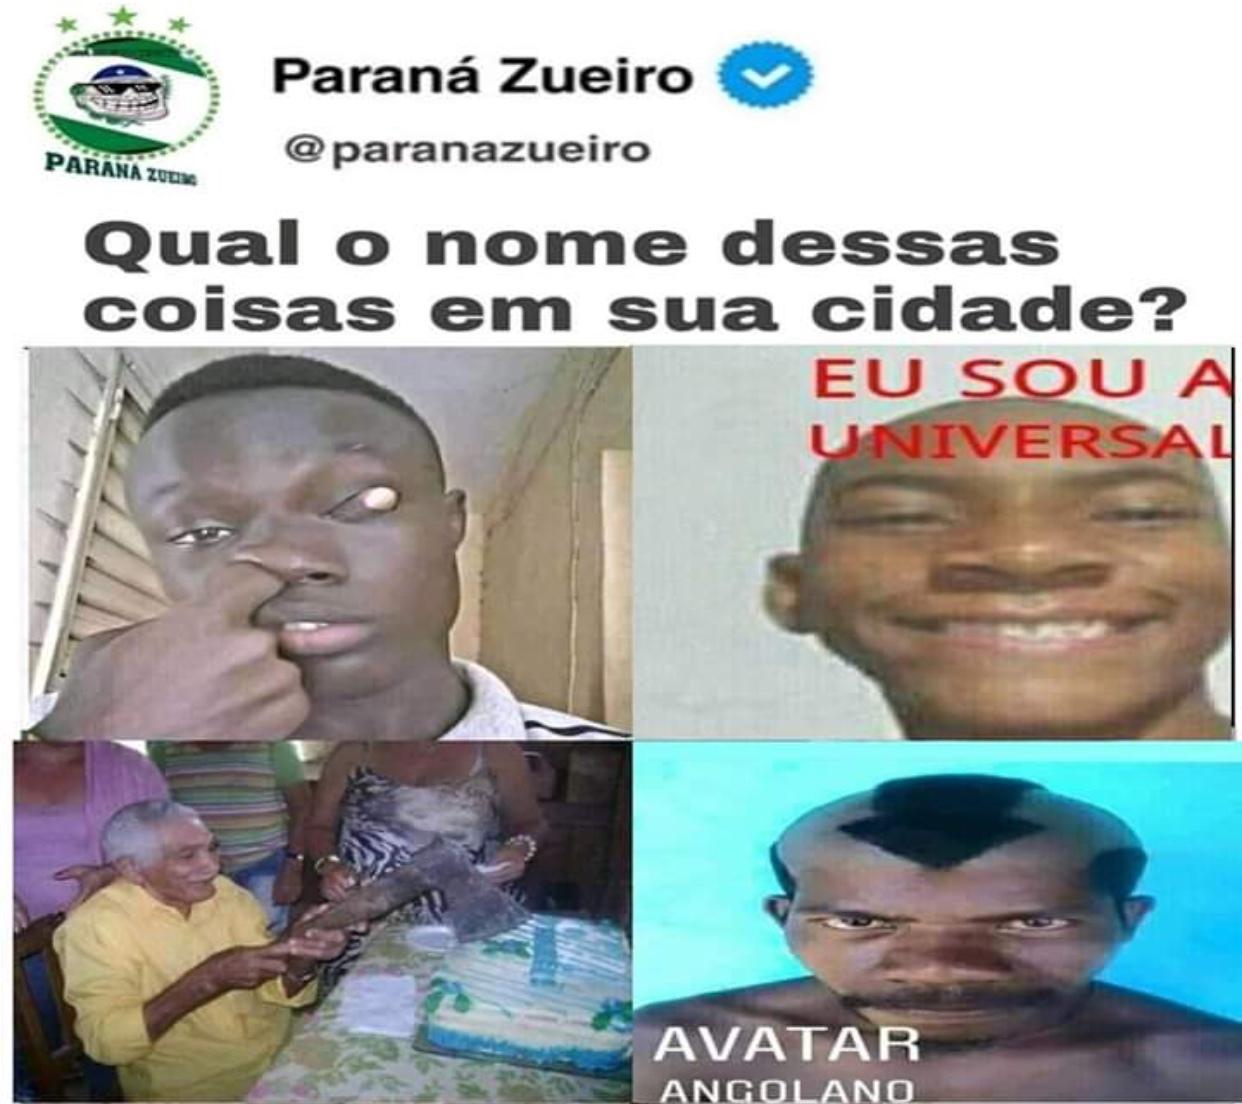 Avatar Angolano - meme